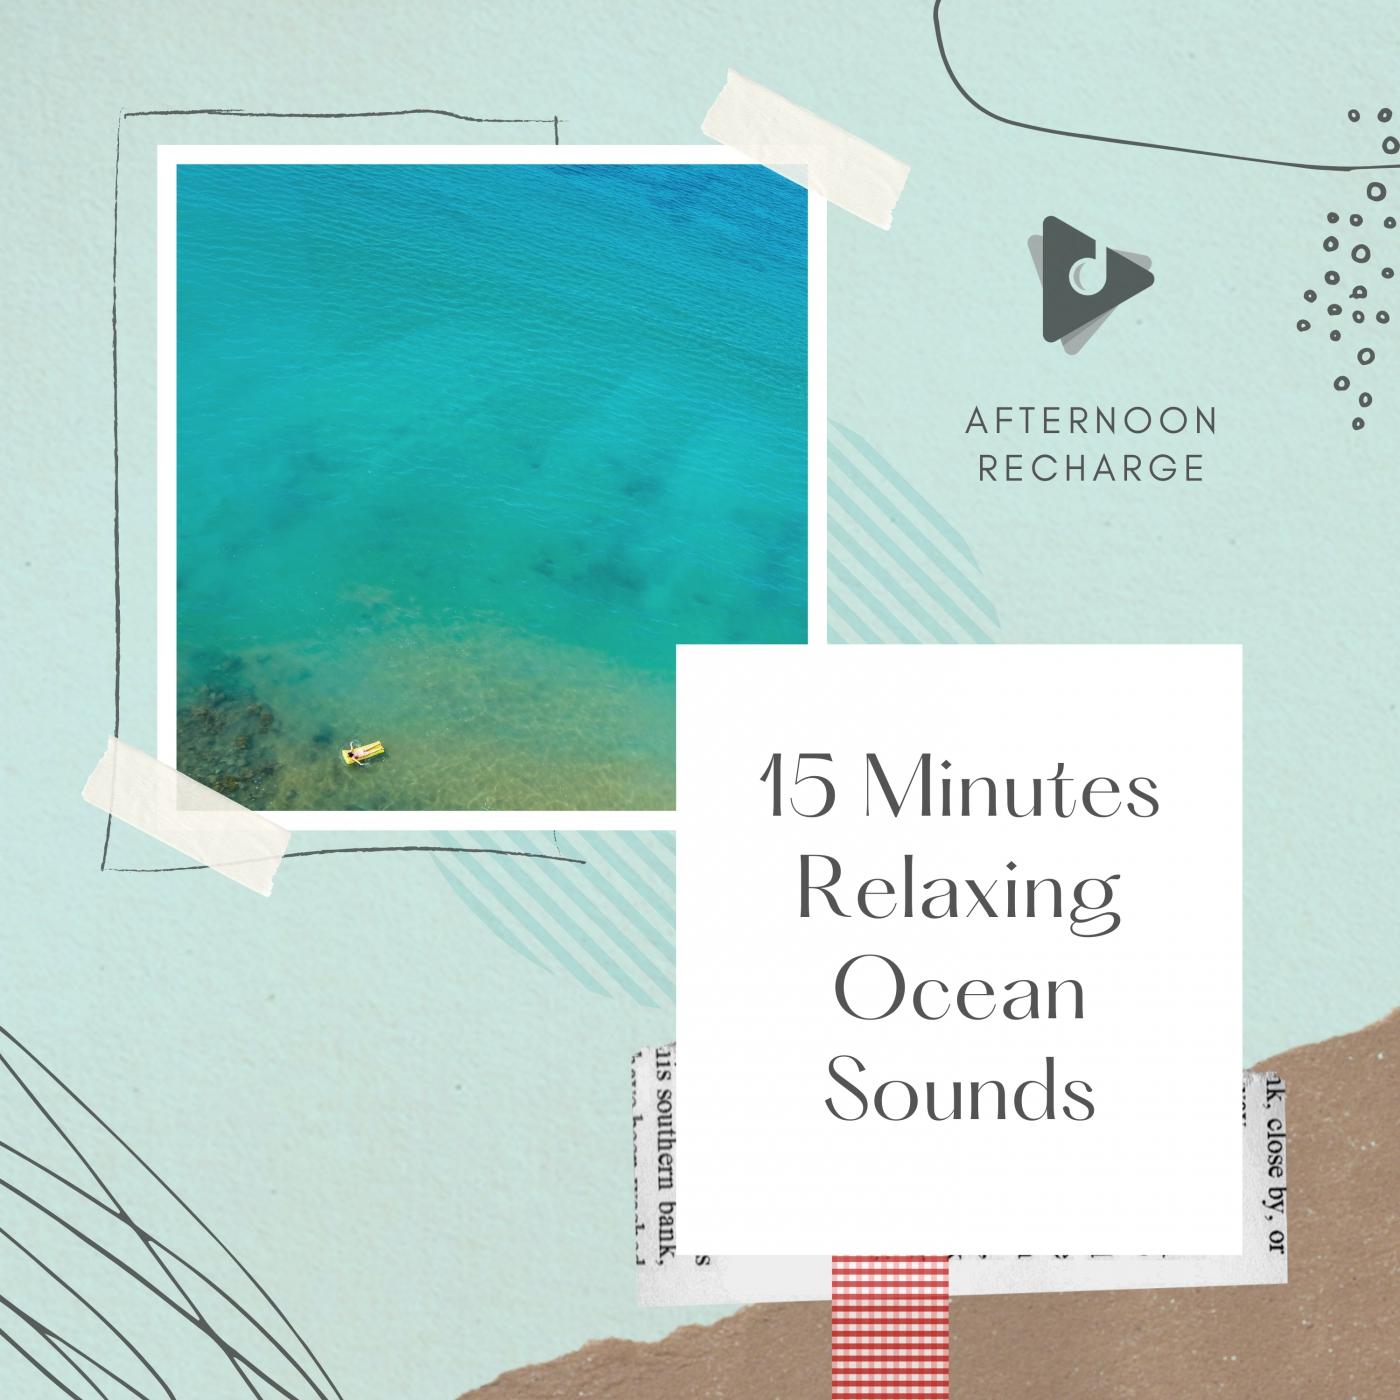 15 Minutes Relaxing Ocean Sounds